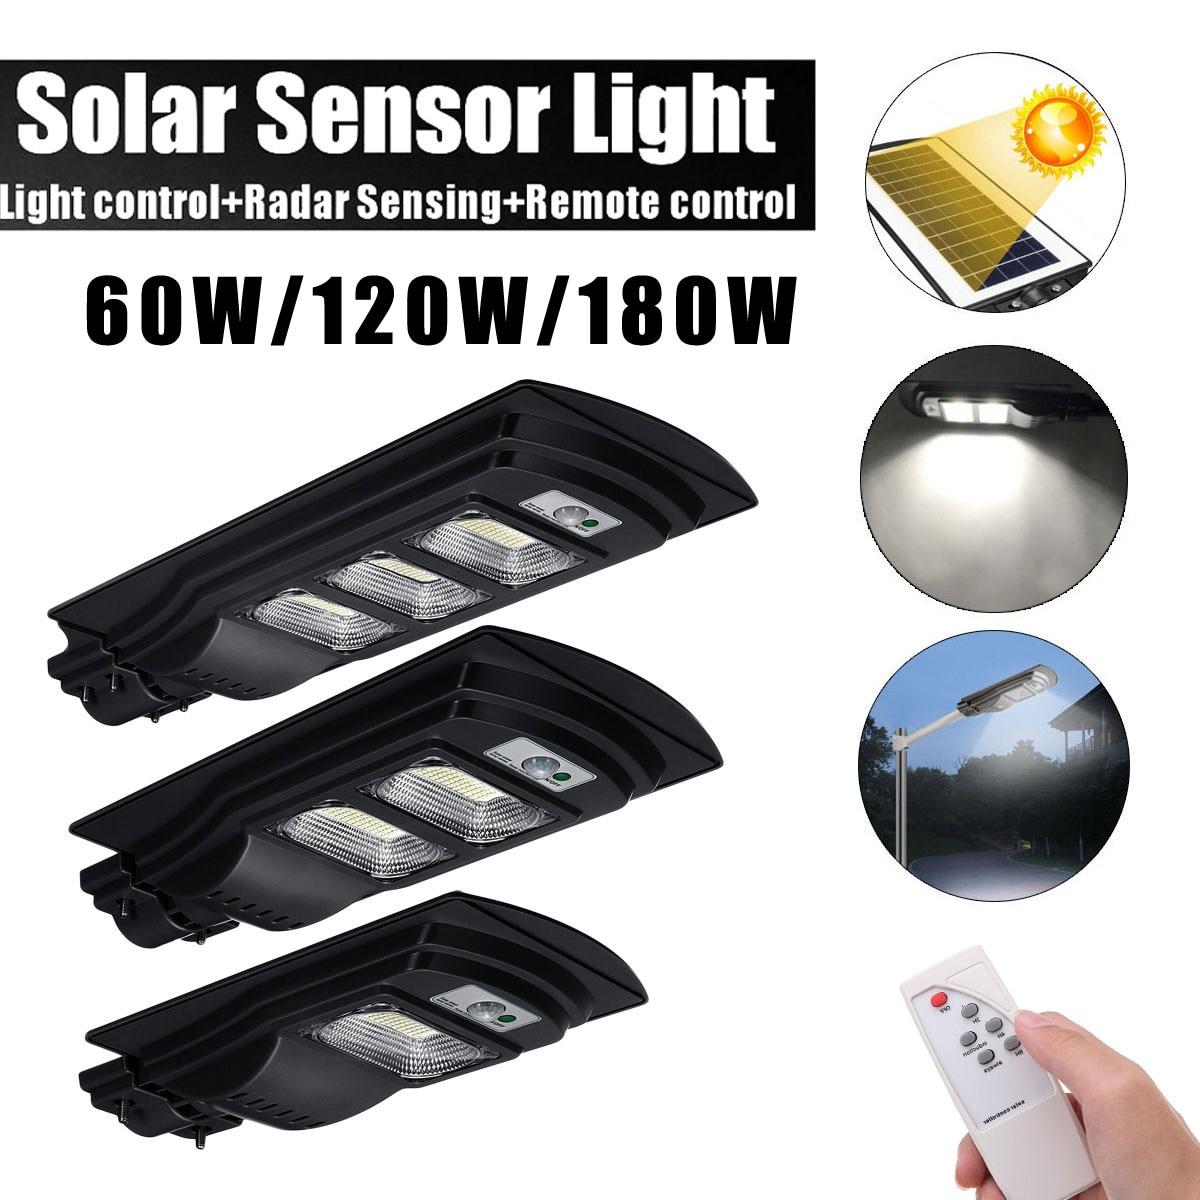 60W/120W/180W LED Solar Street Light Solar Light Radar PIR Motion Sensor Wall Timing Lamp+Remote Comtrol Waterproof For Plaza